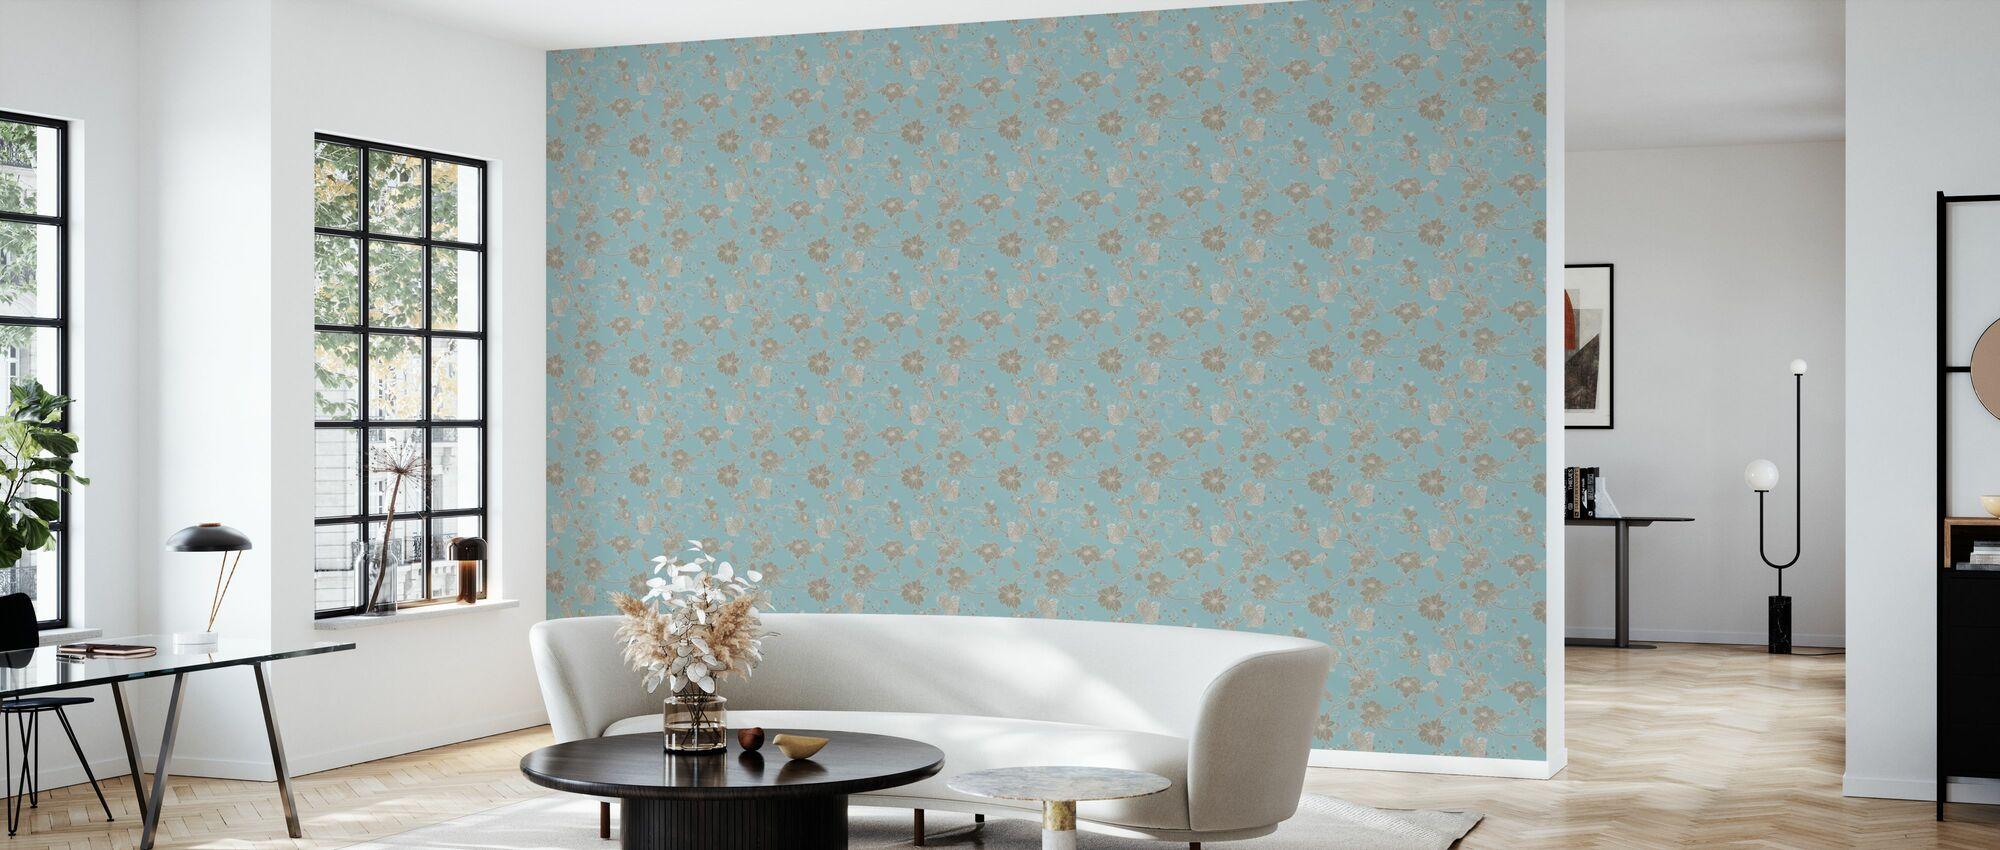 Botanica - Turquoise - Wallpaper - Living Room